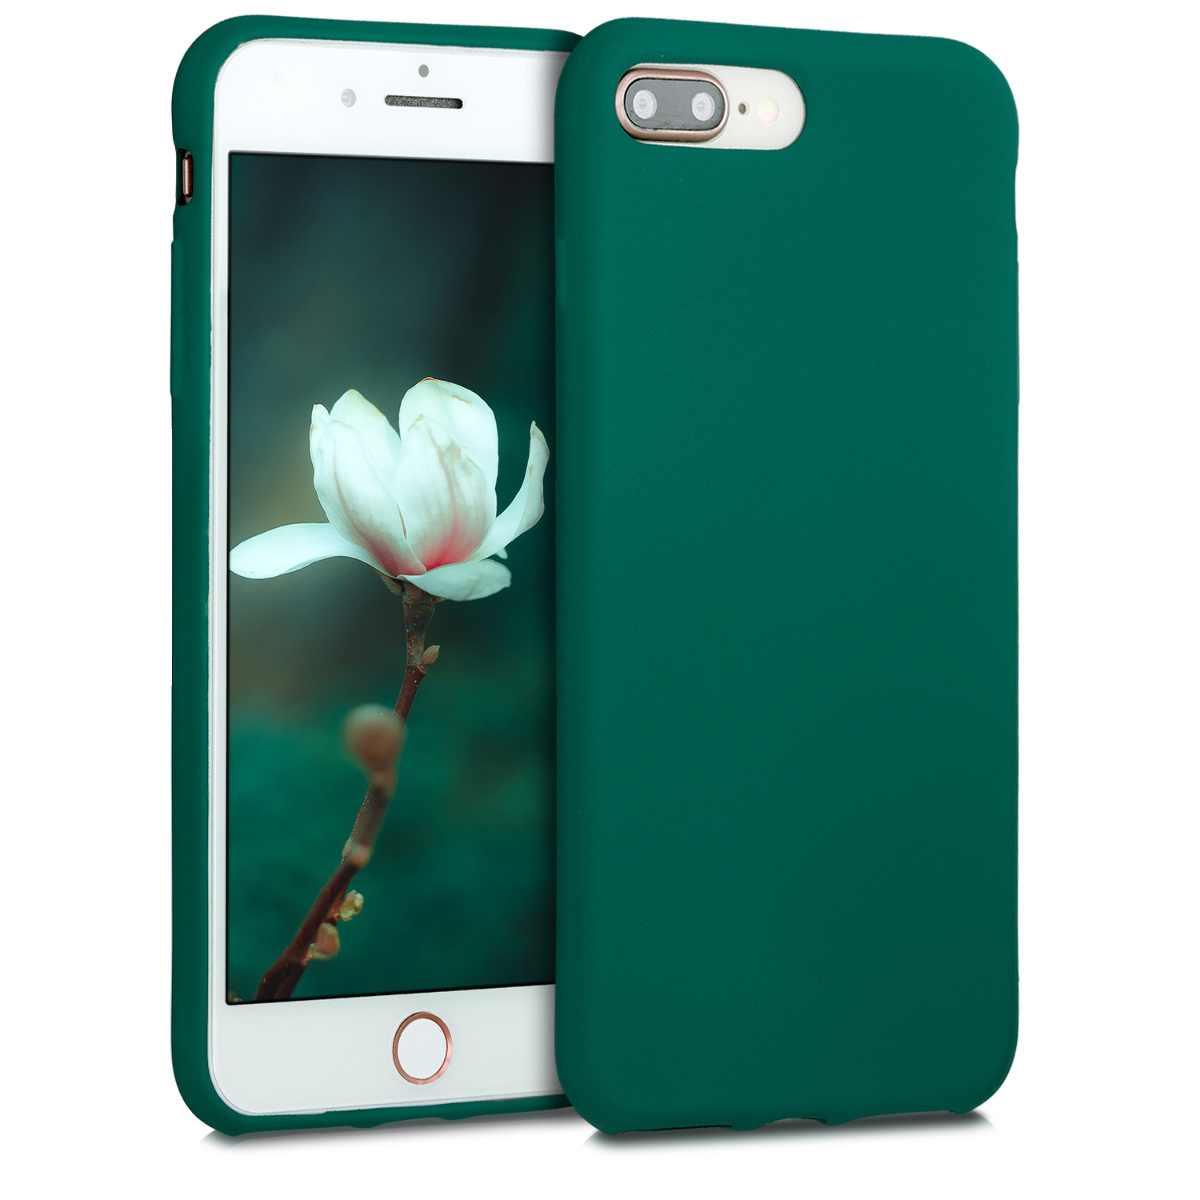 KW Θήκη Σιλικόνης Apple iPhone 7 Plus / 8 Plus - Dark Metallic Green (40351.170)